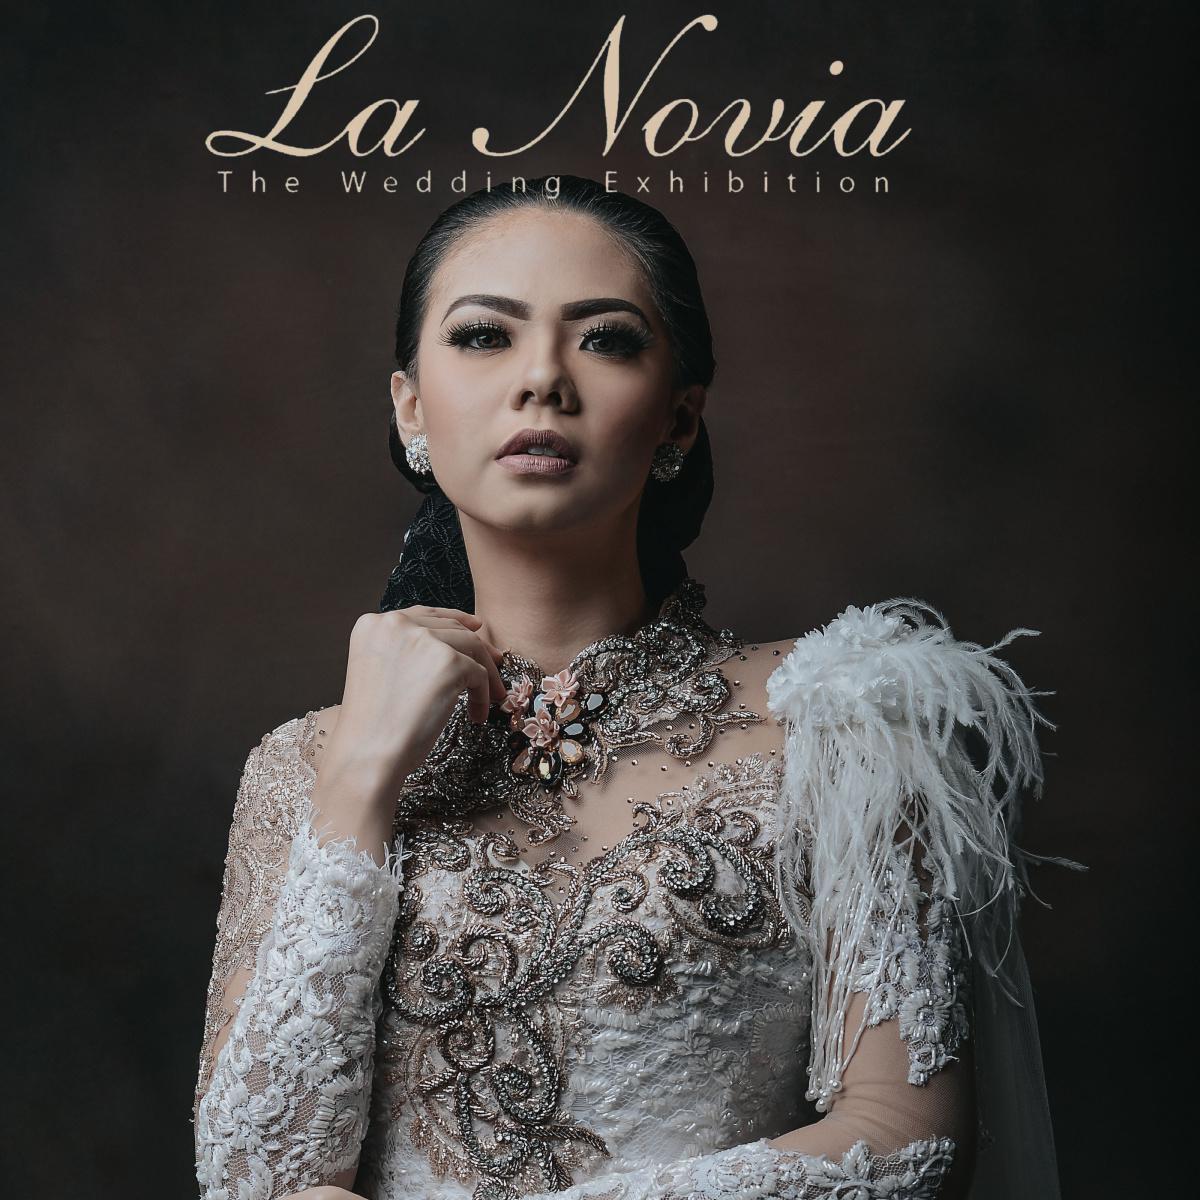 About La Novia